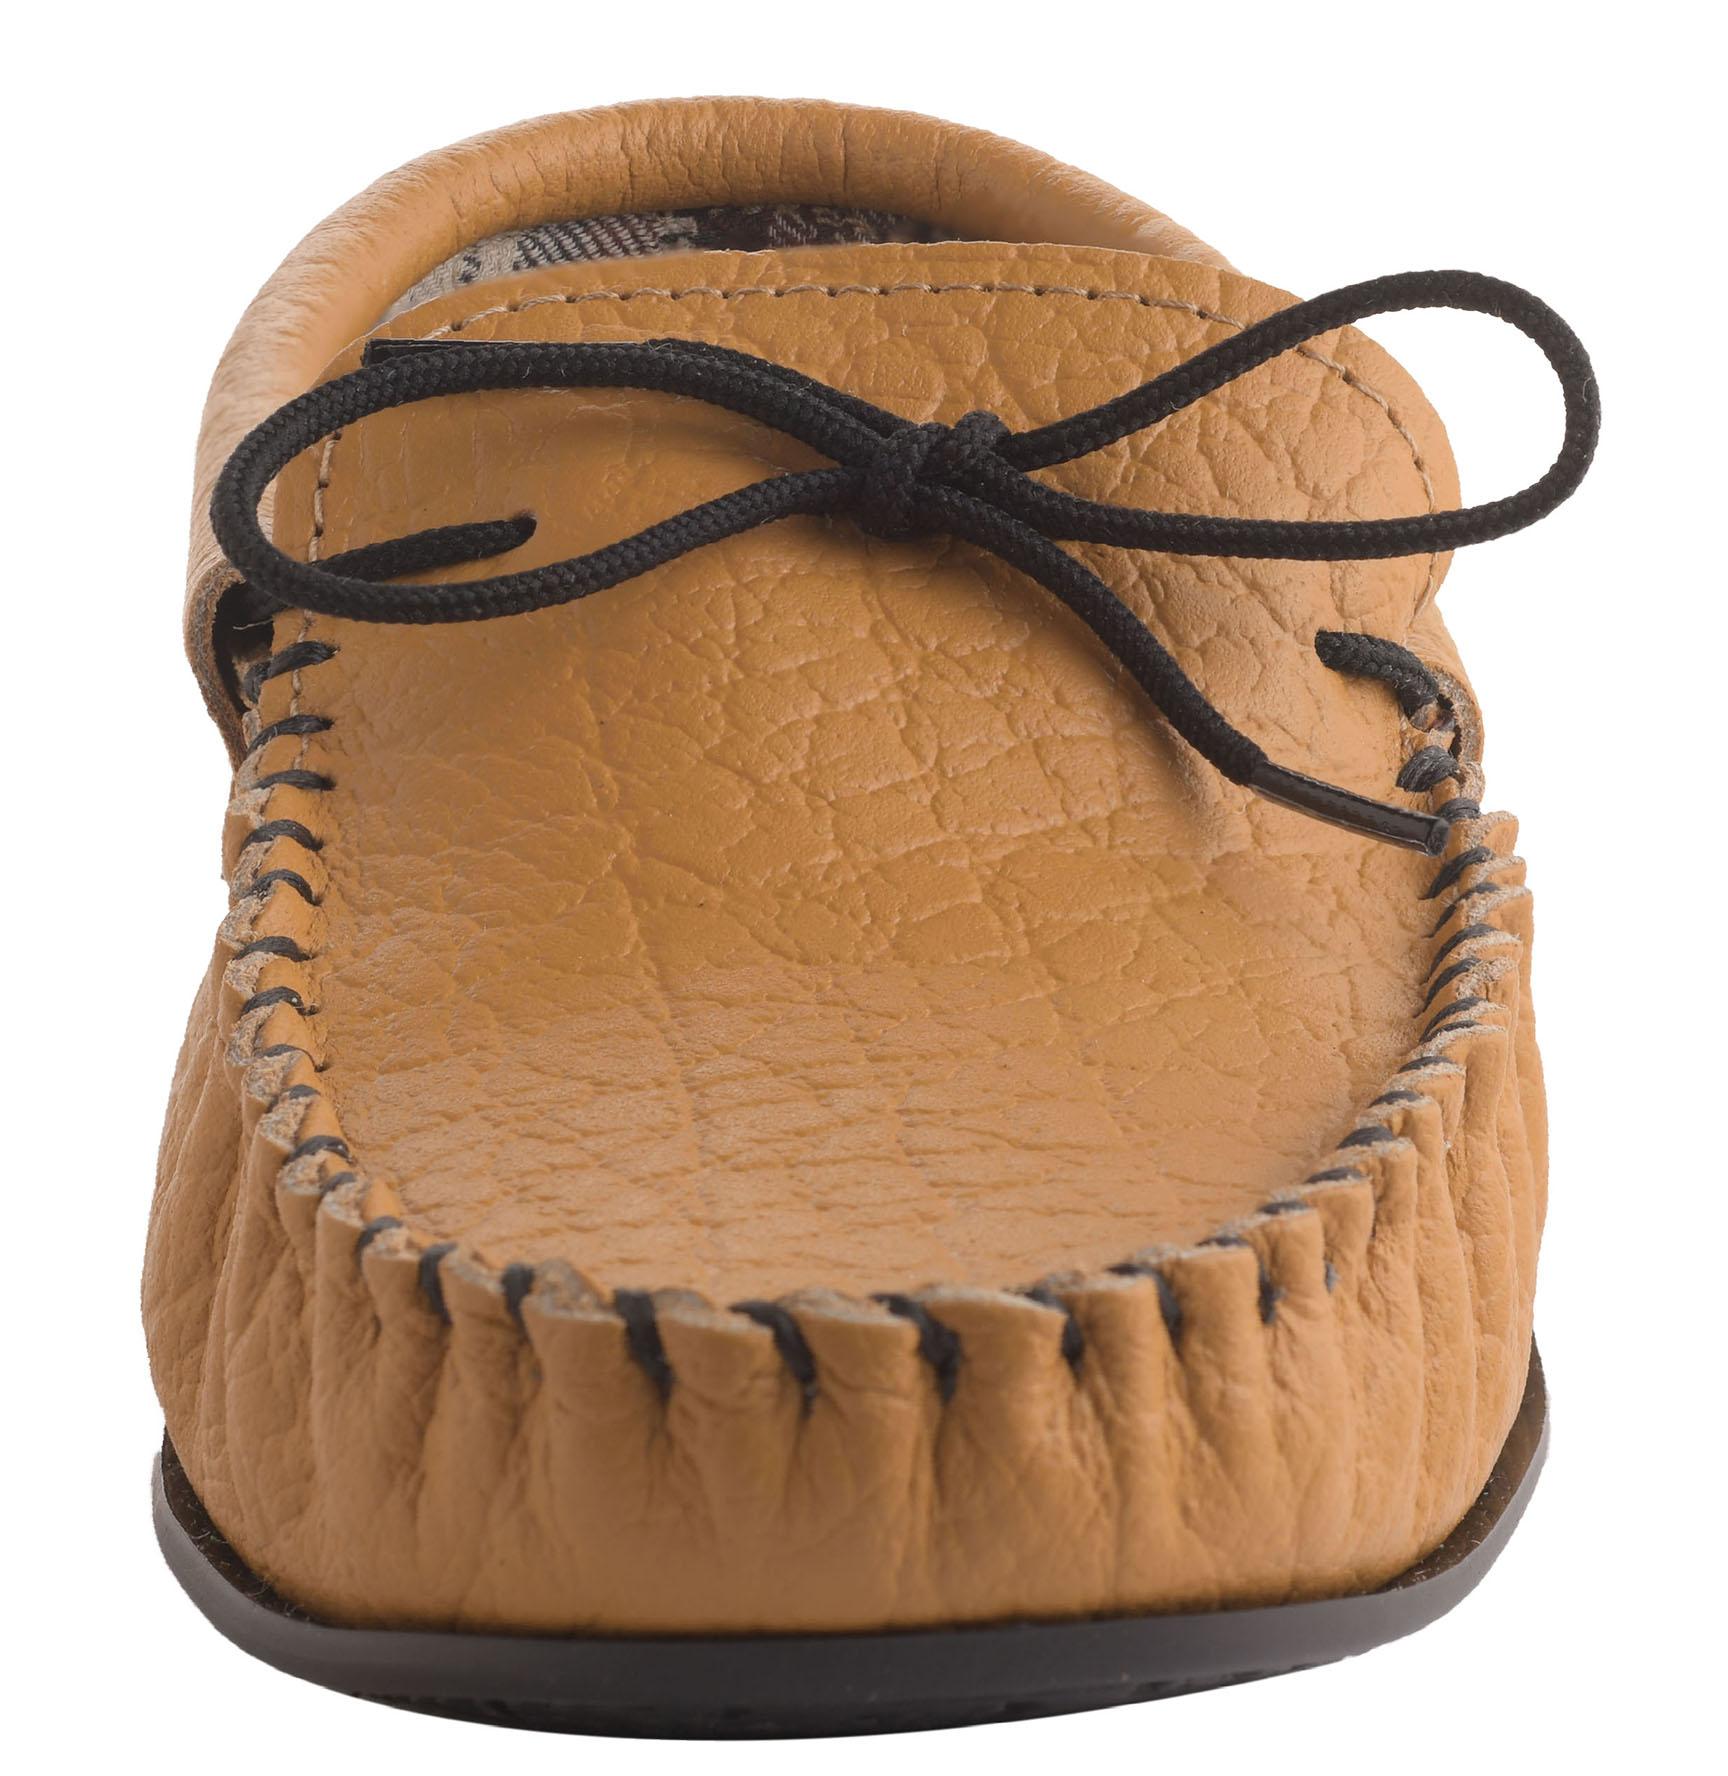 e286dc8dfc8 Mens Gents Tan Genuine Leather Moccasin Slipper Cotton PVC Sole UK7 ...